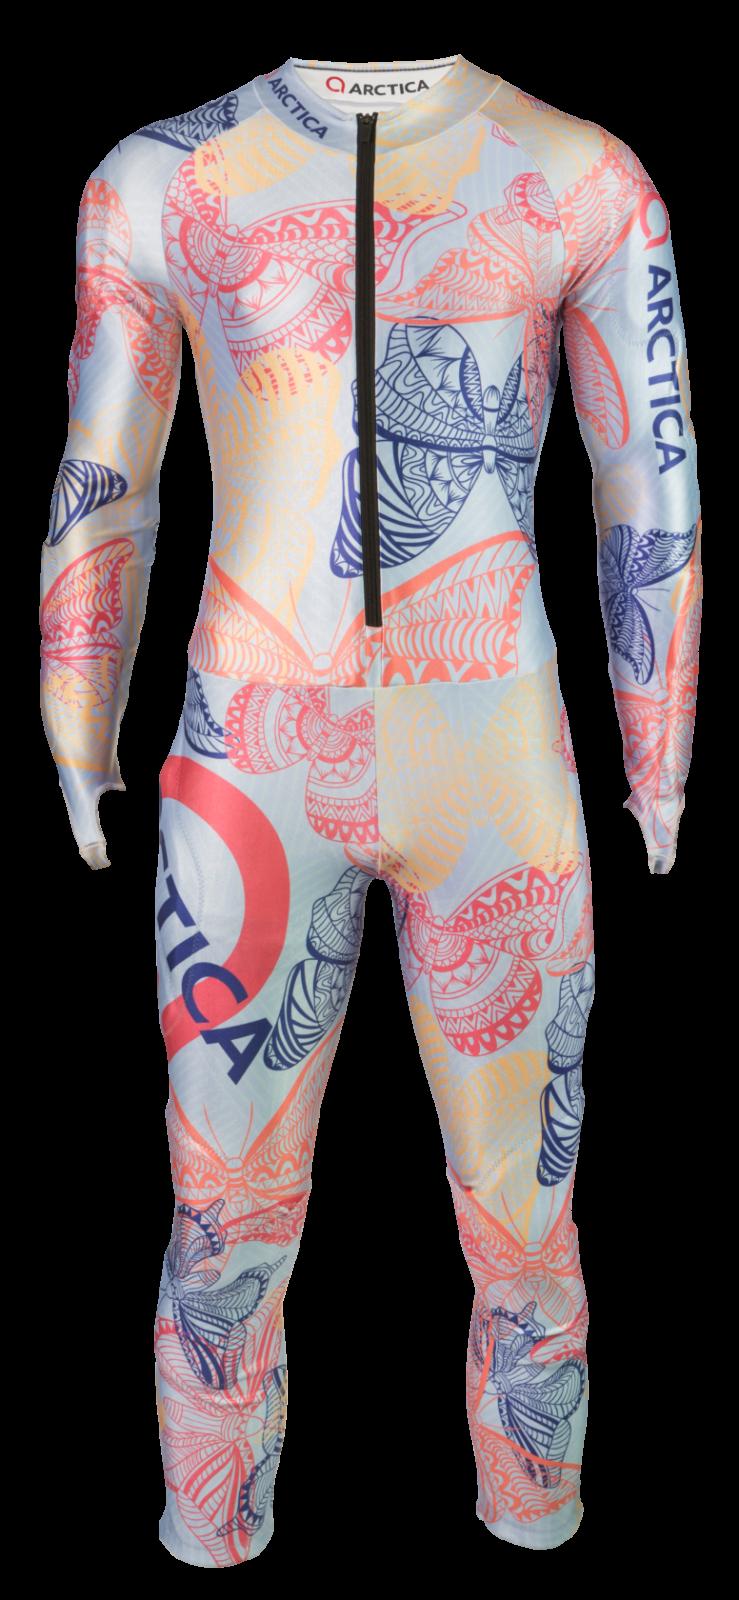 Arctica Adult Butterfly GS Suit